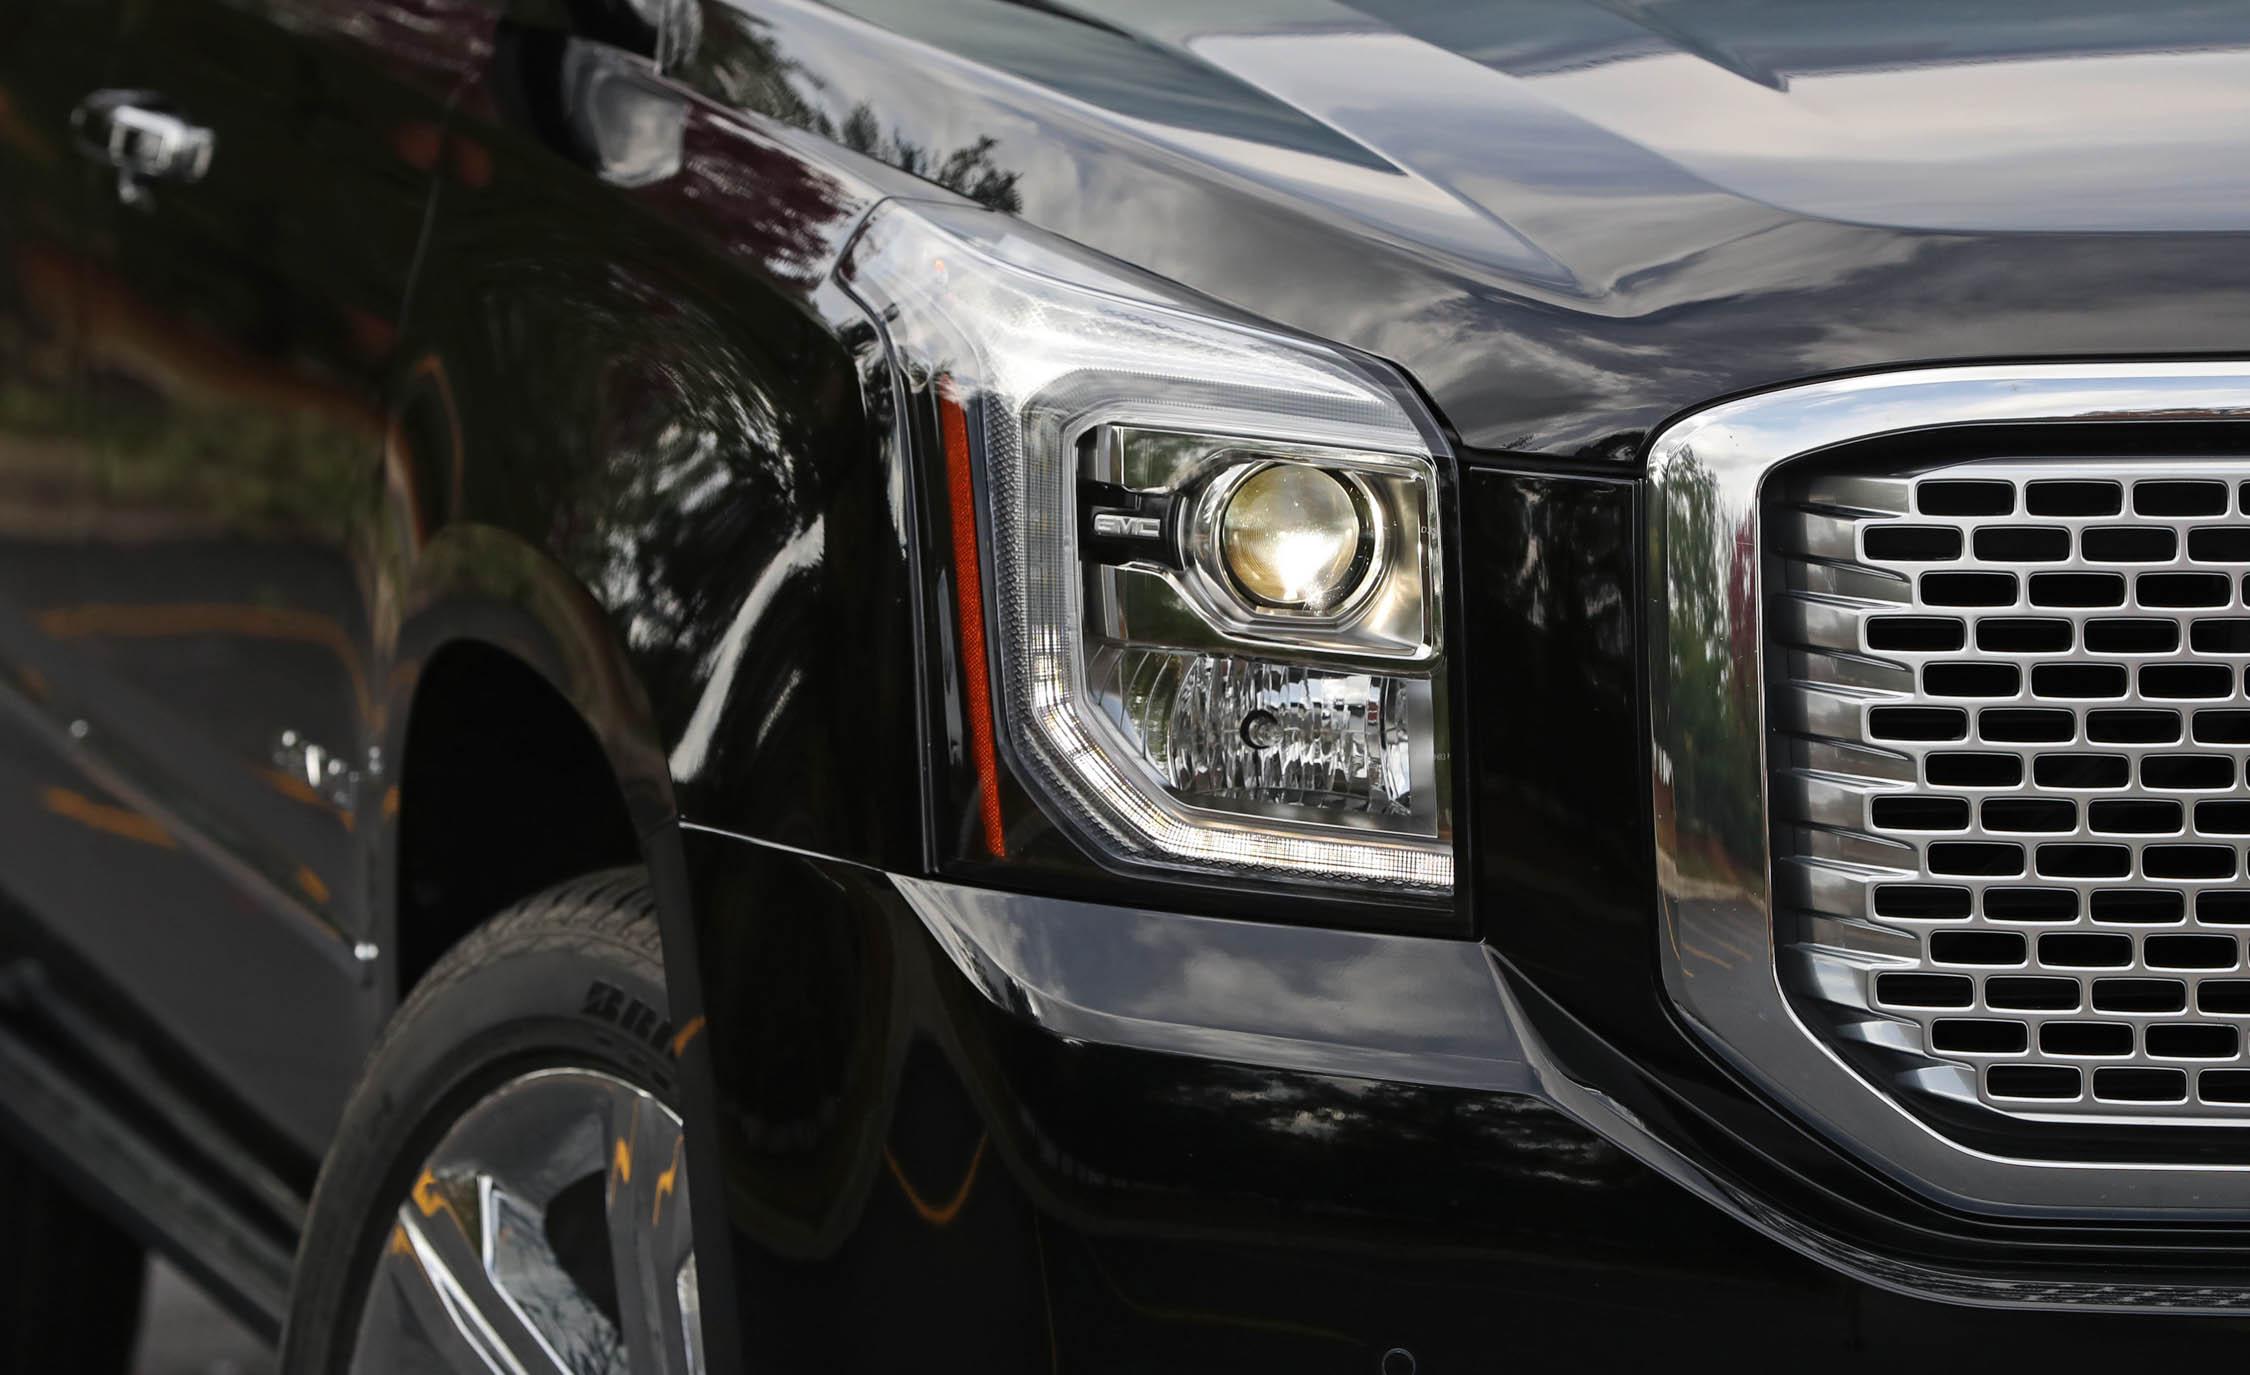 2017 Gmc Yukon Xl Denali Exterior View Headlight (View 18 of 26)